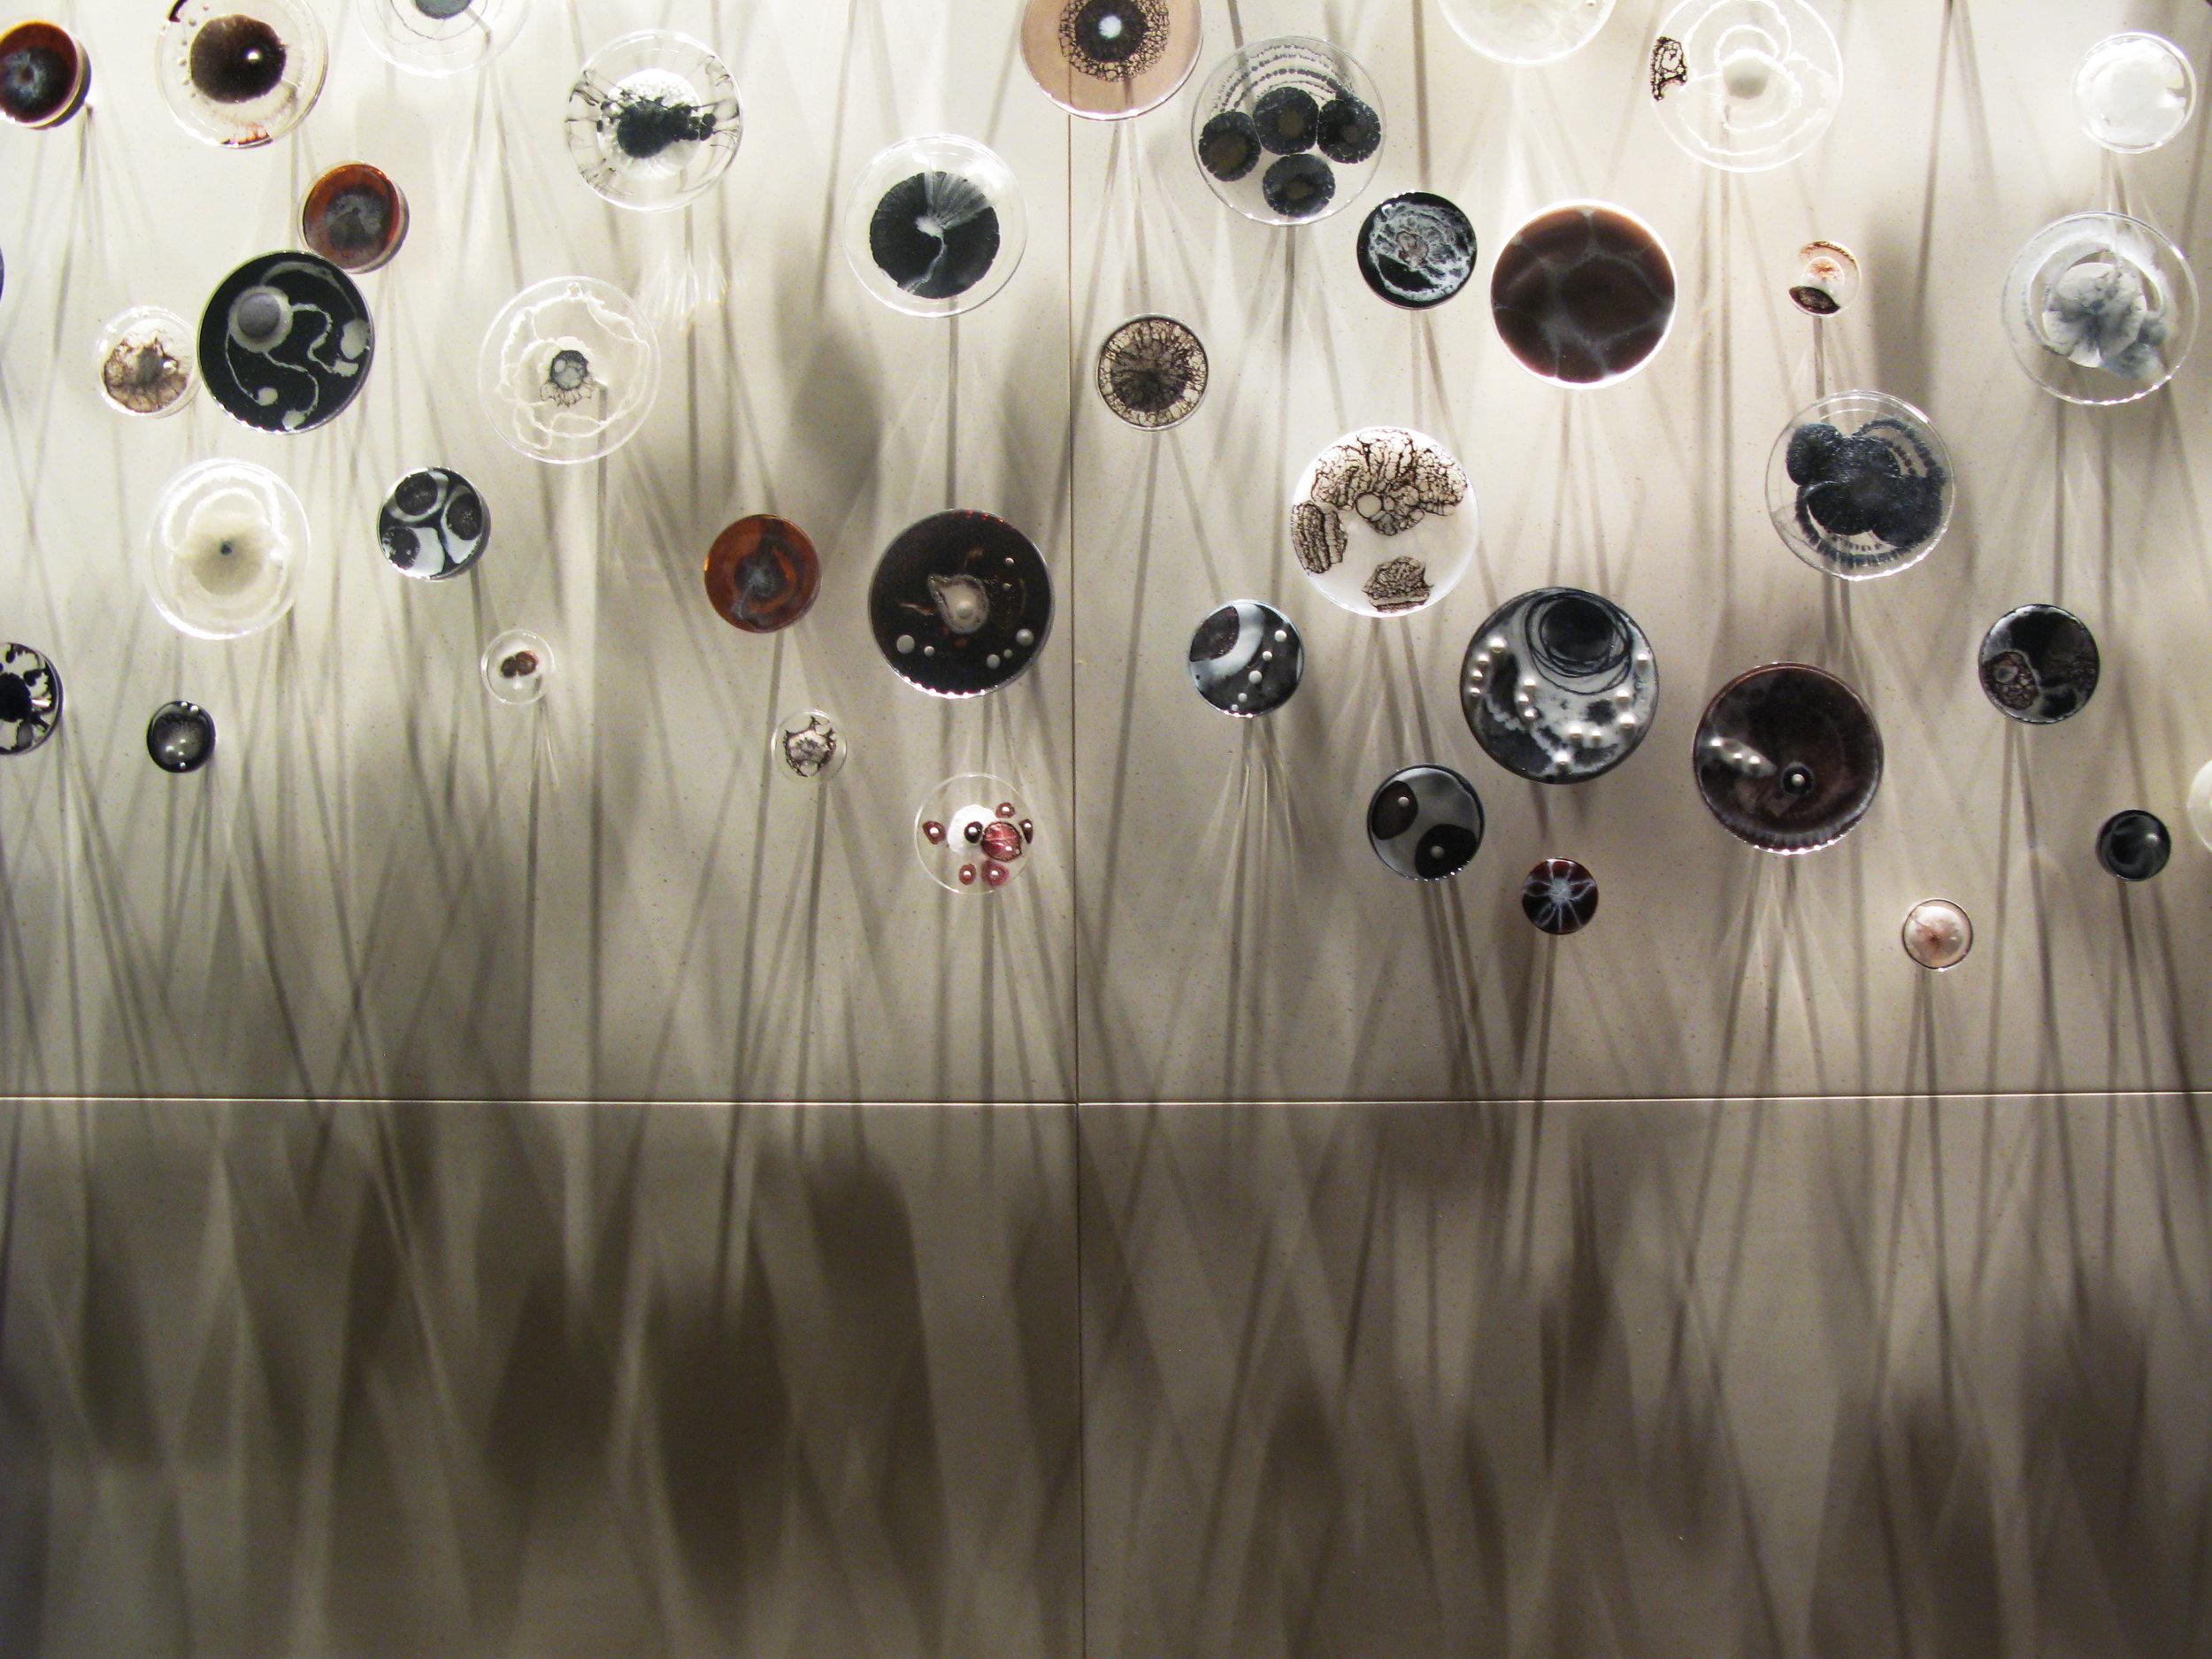 Amorphous petri dish Installation by Klari Reis.  Peninsula Shanghai Hotel. Detail image of neutral colored 150 piece installation.